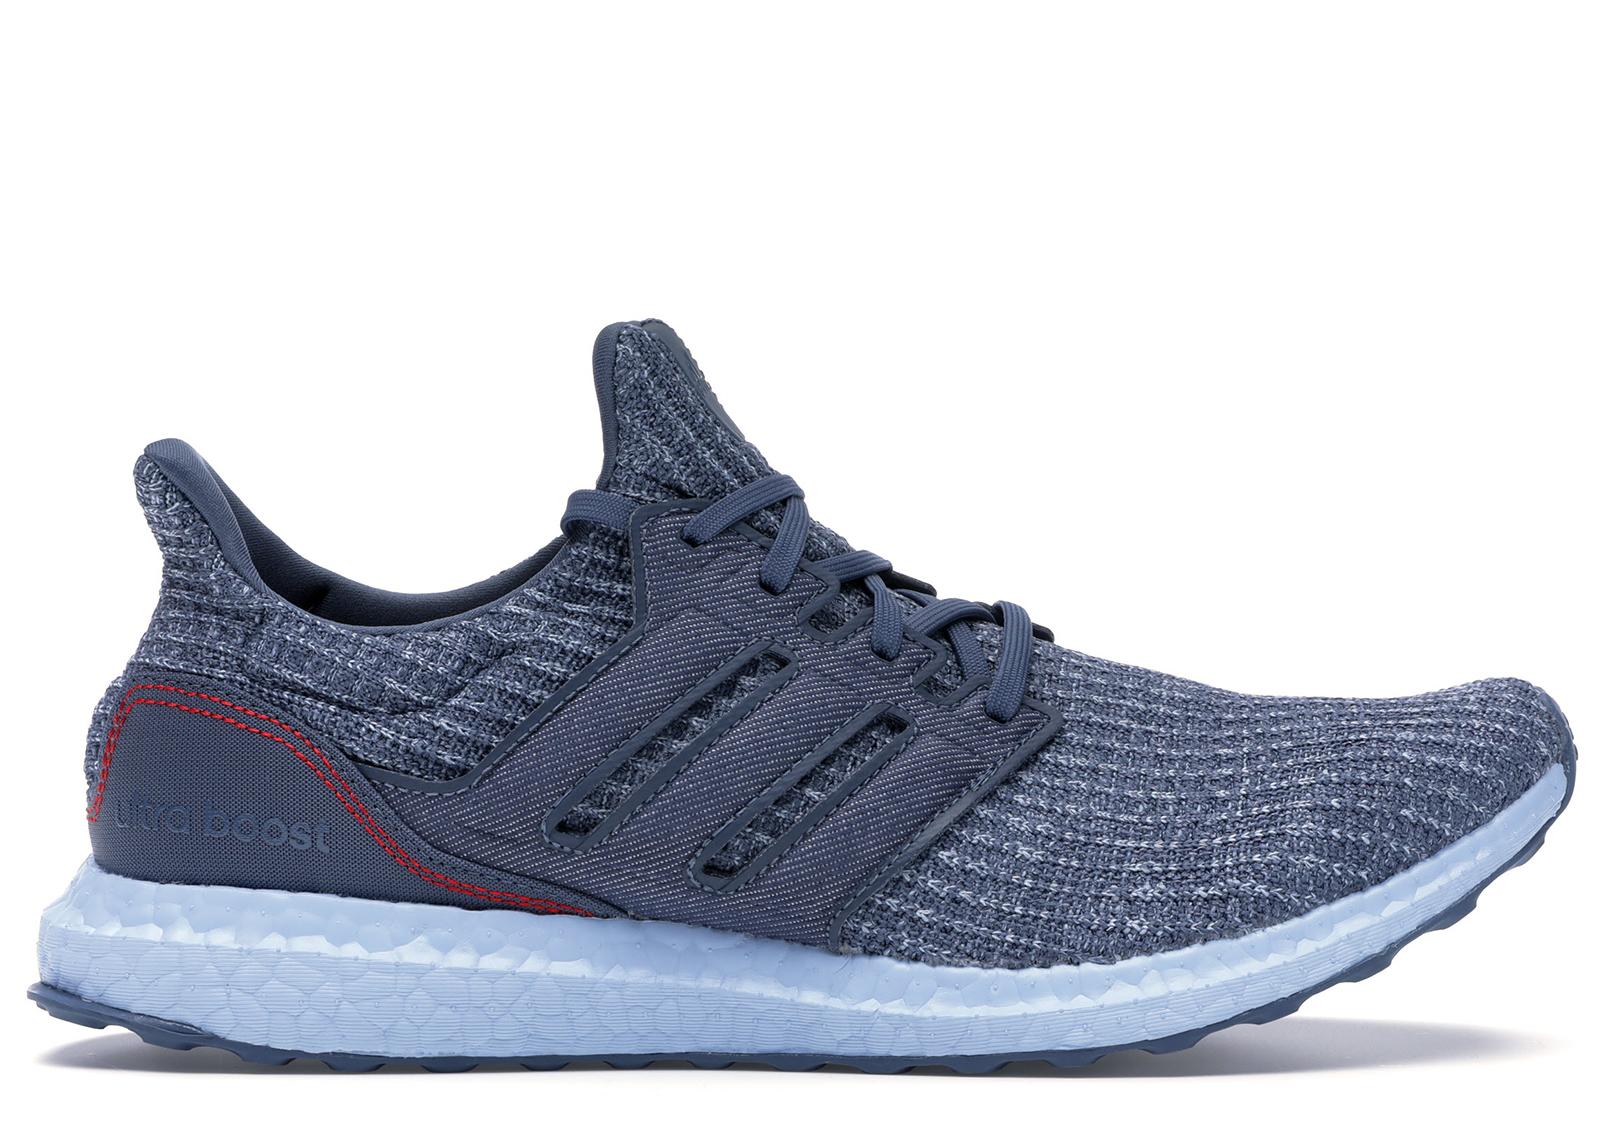 Adidas Ultraboost Cbc Black Purple Pink Men Running Tra